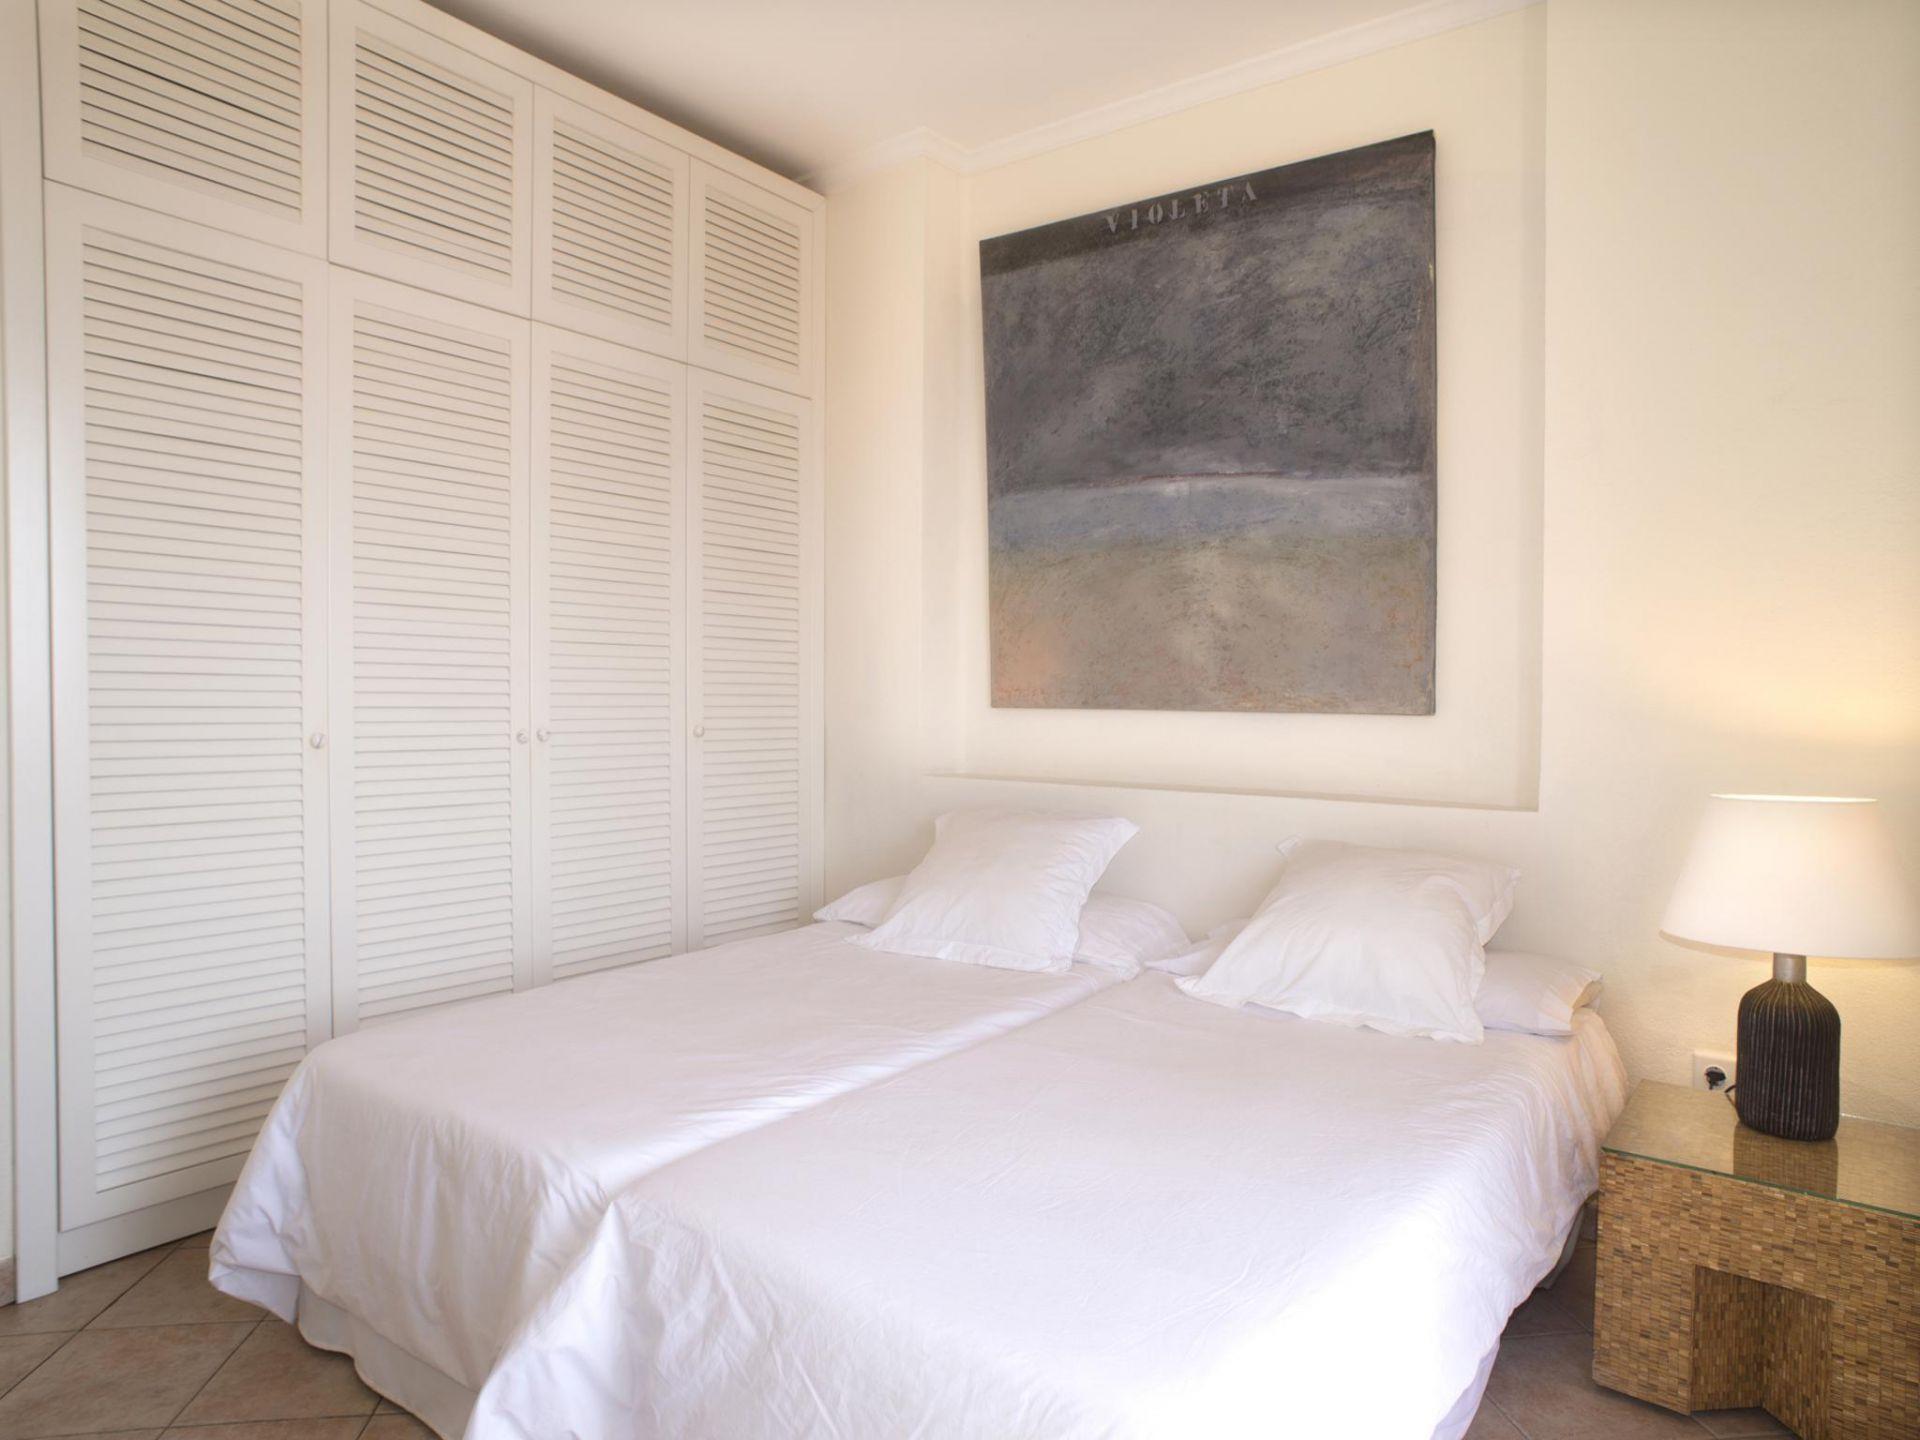 Holiday apartment Villa San Agustin 10 - Holiday Rental (854295), Maspalomas, Gran Canaria, Canary Islands, Spain, picture 20